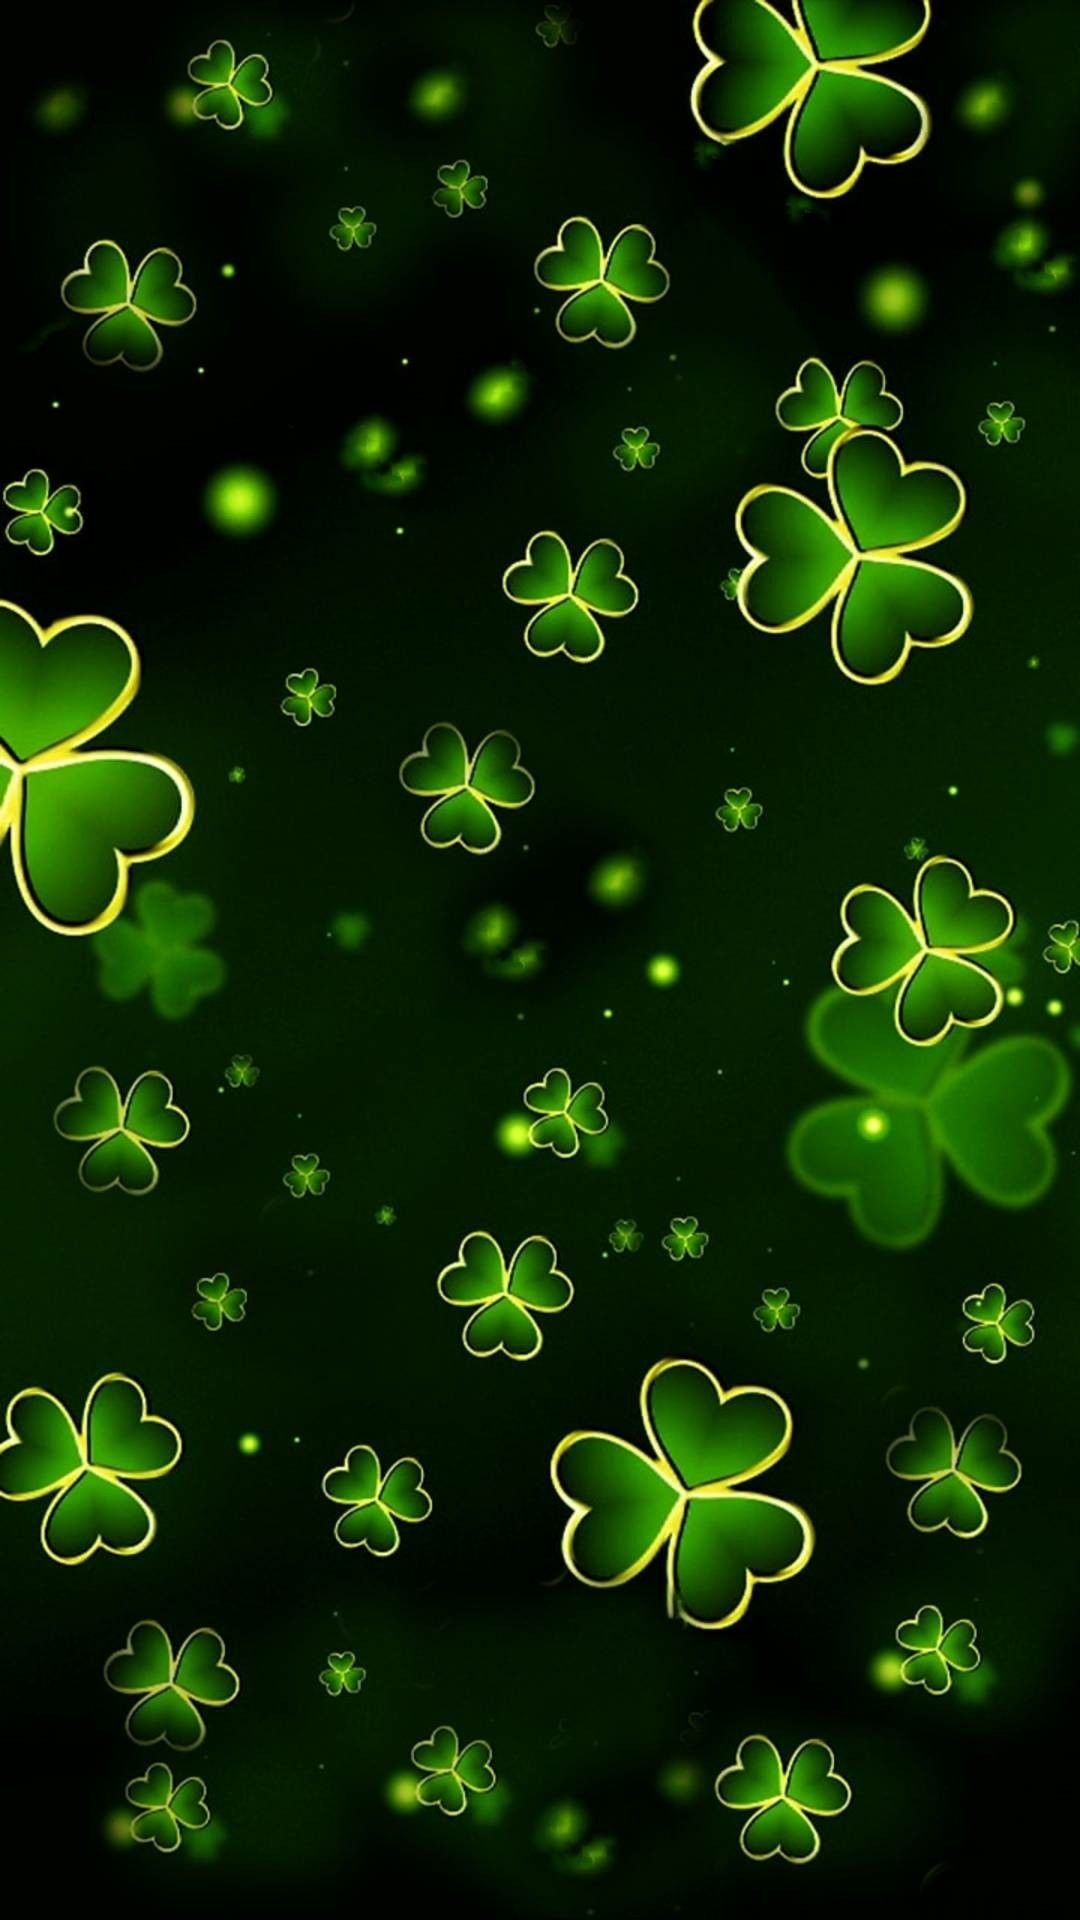 Green with gold trim shamrocks | St patricks day wallpaper ...